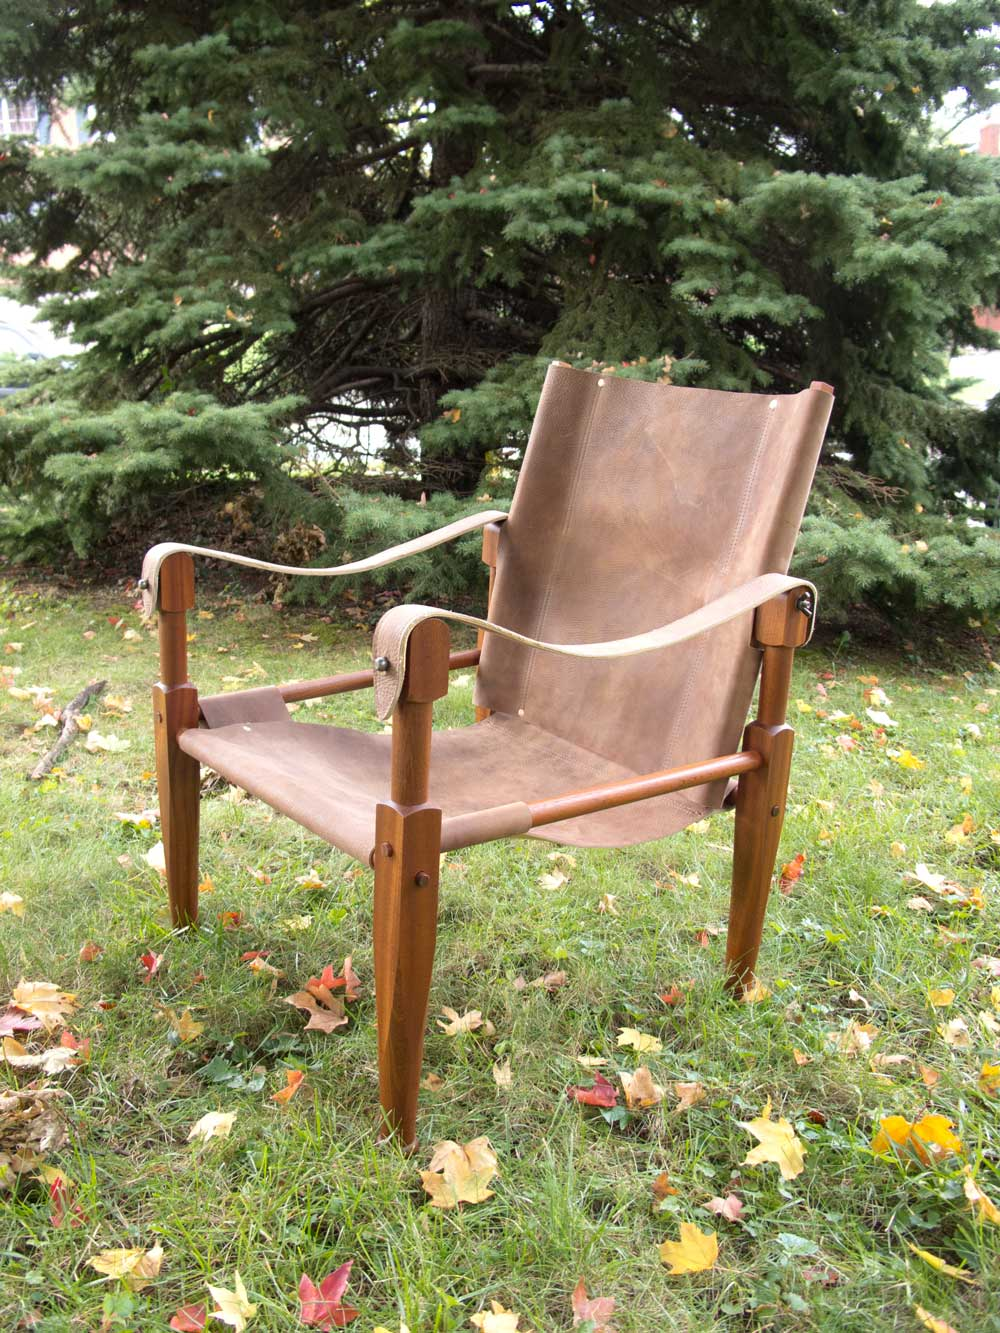 Beau Roorkhee Chair In U0027Crazy Horseu0027 Leather